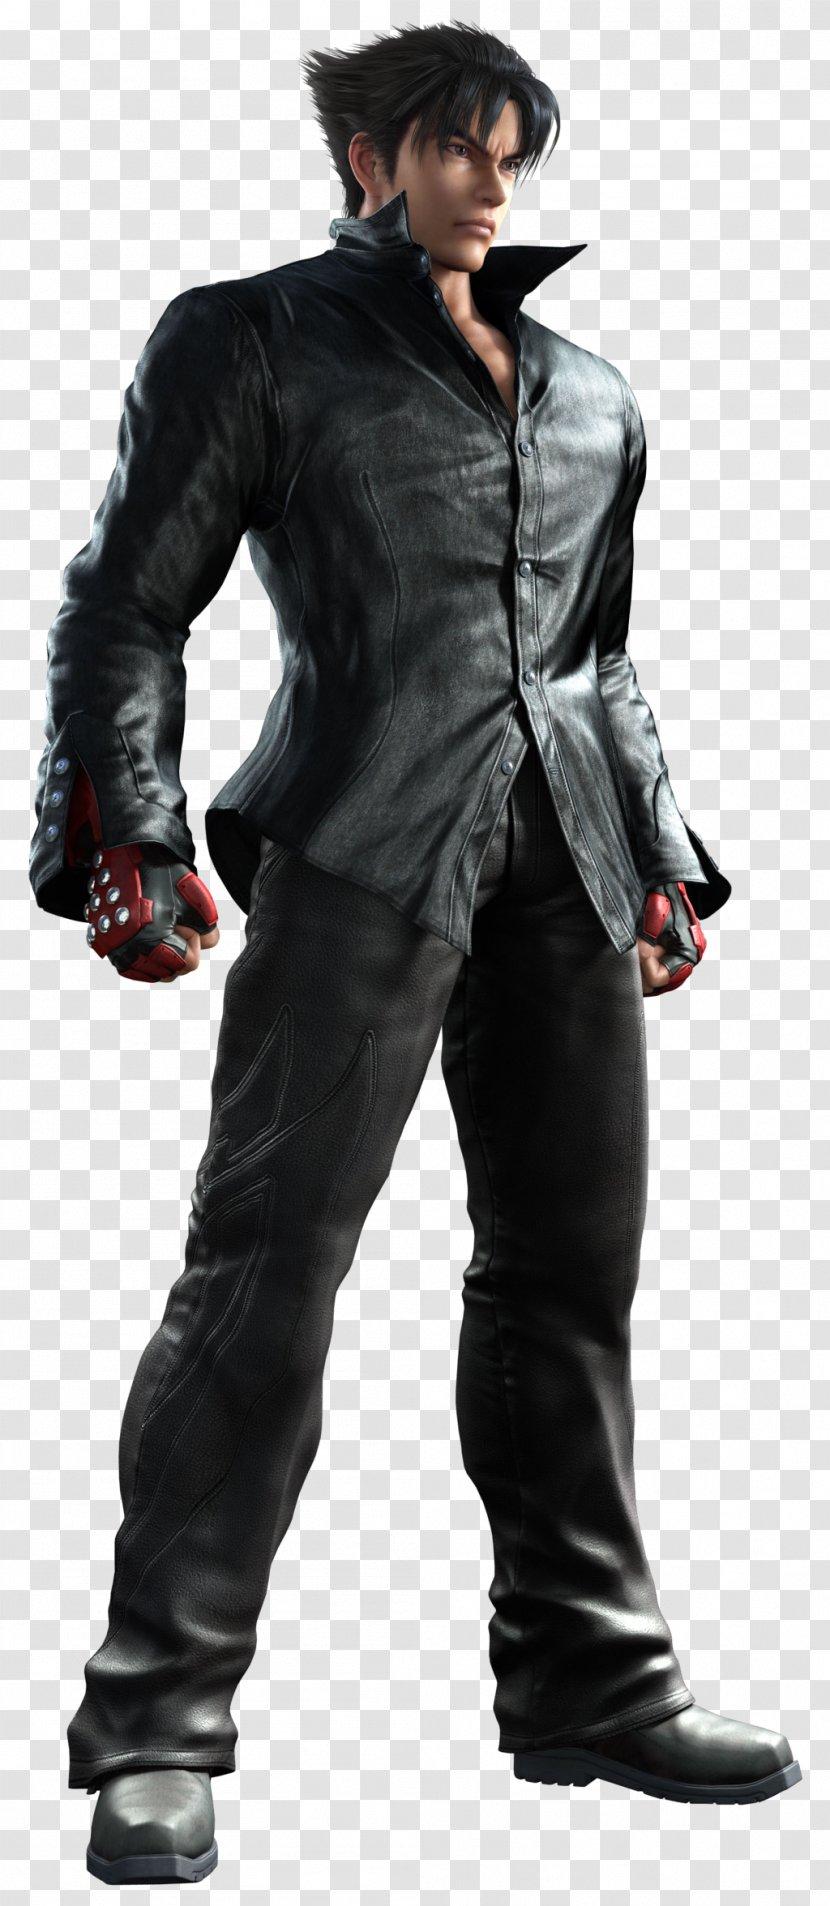 Tekken 5 4 6 7 Tag Tournament 2 Costume Style Transparent Png